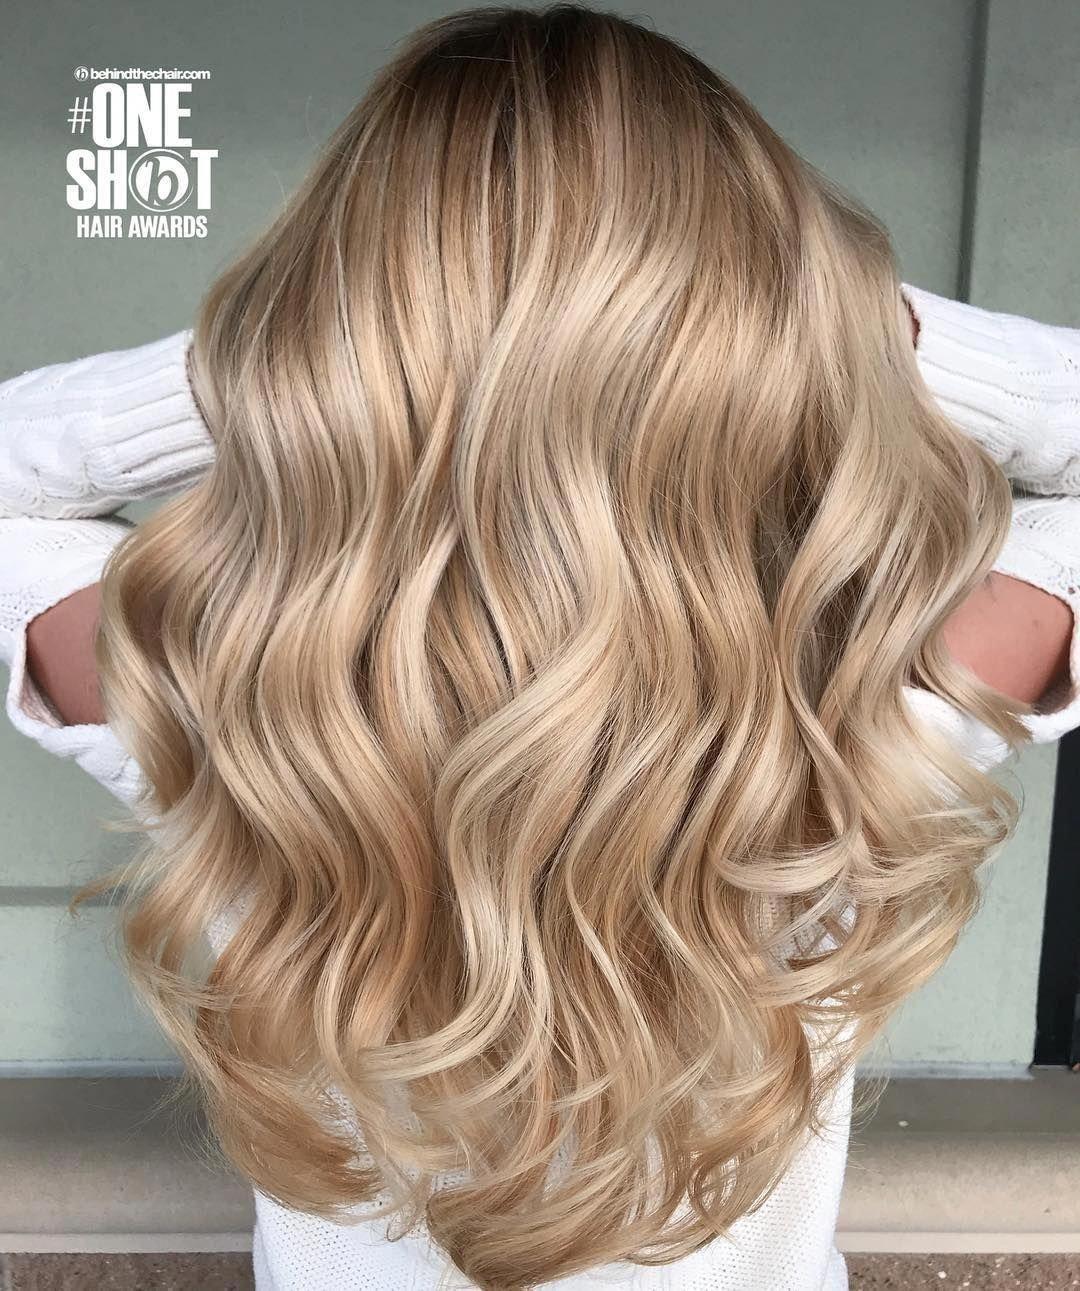 Clairol Shimmer Lights Original Shampoo Blonde and